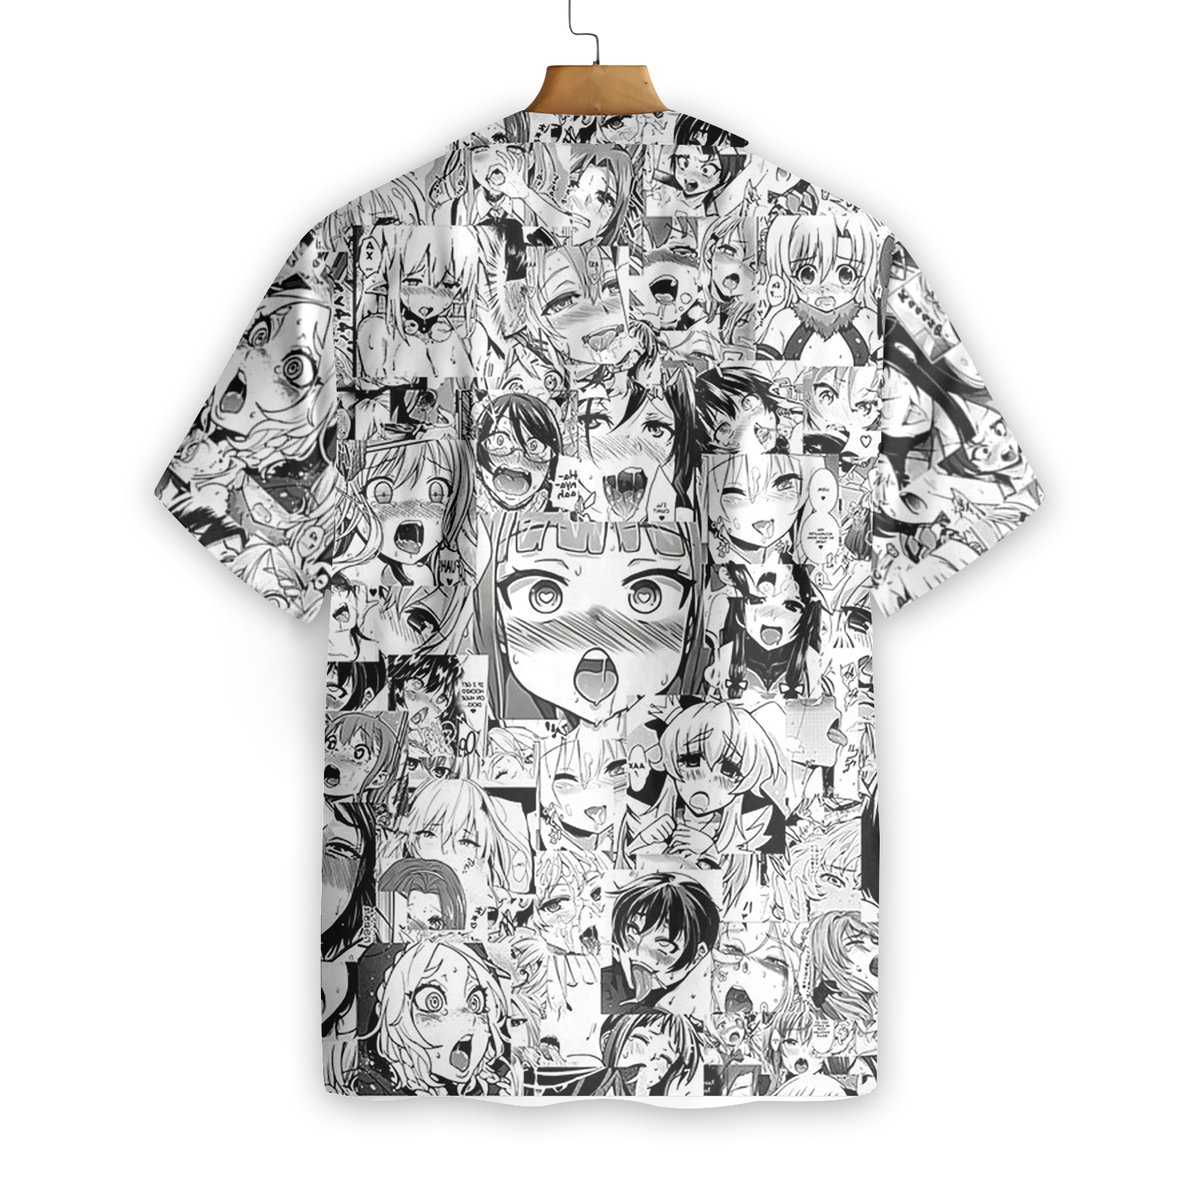 Hot Chick Anime Hawaiian Shirt1